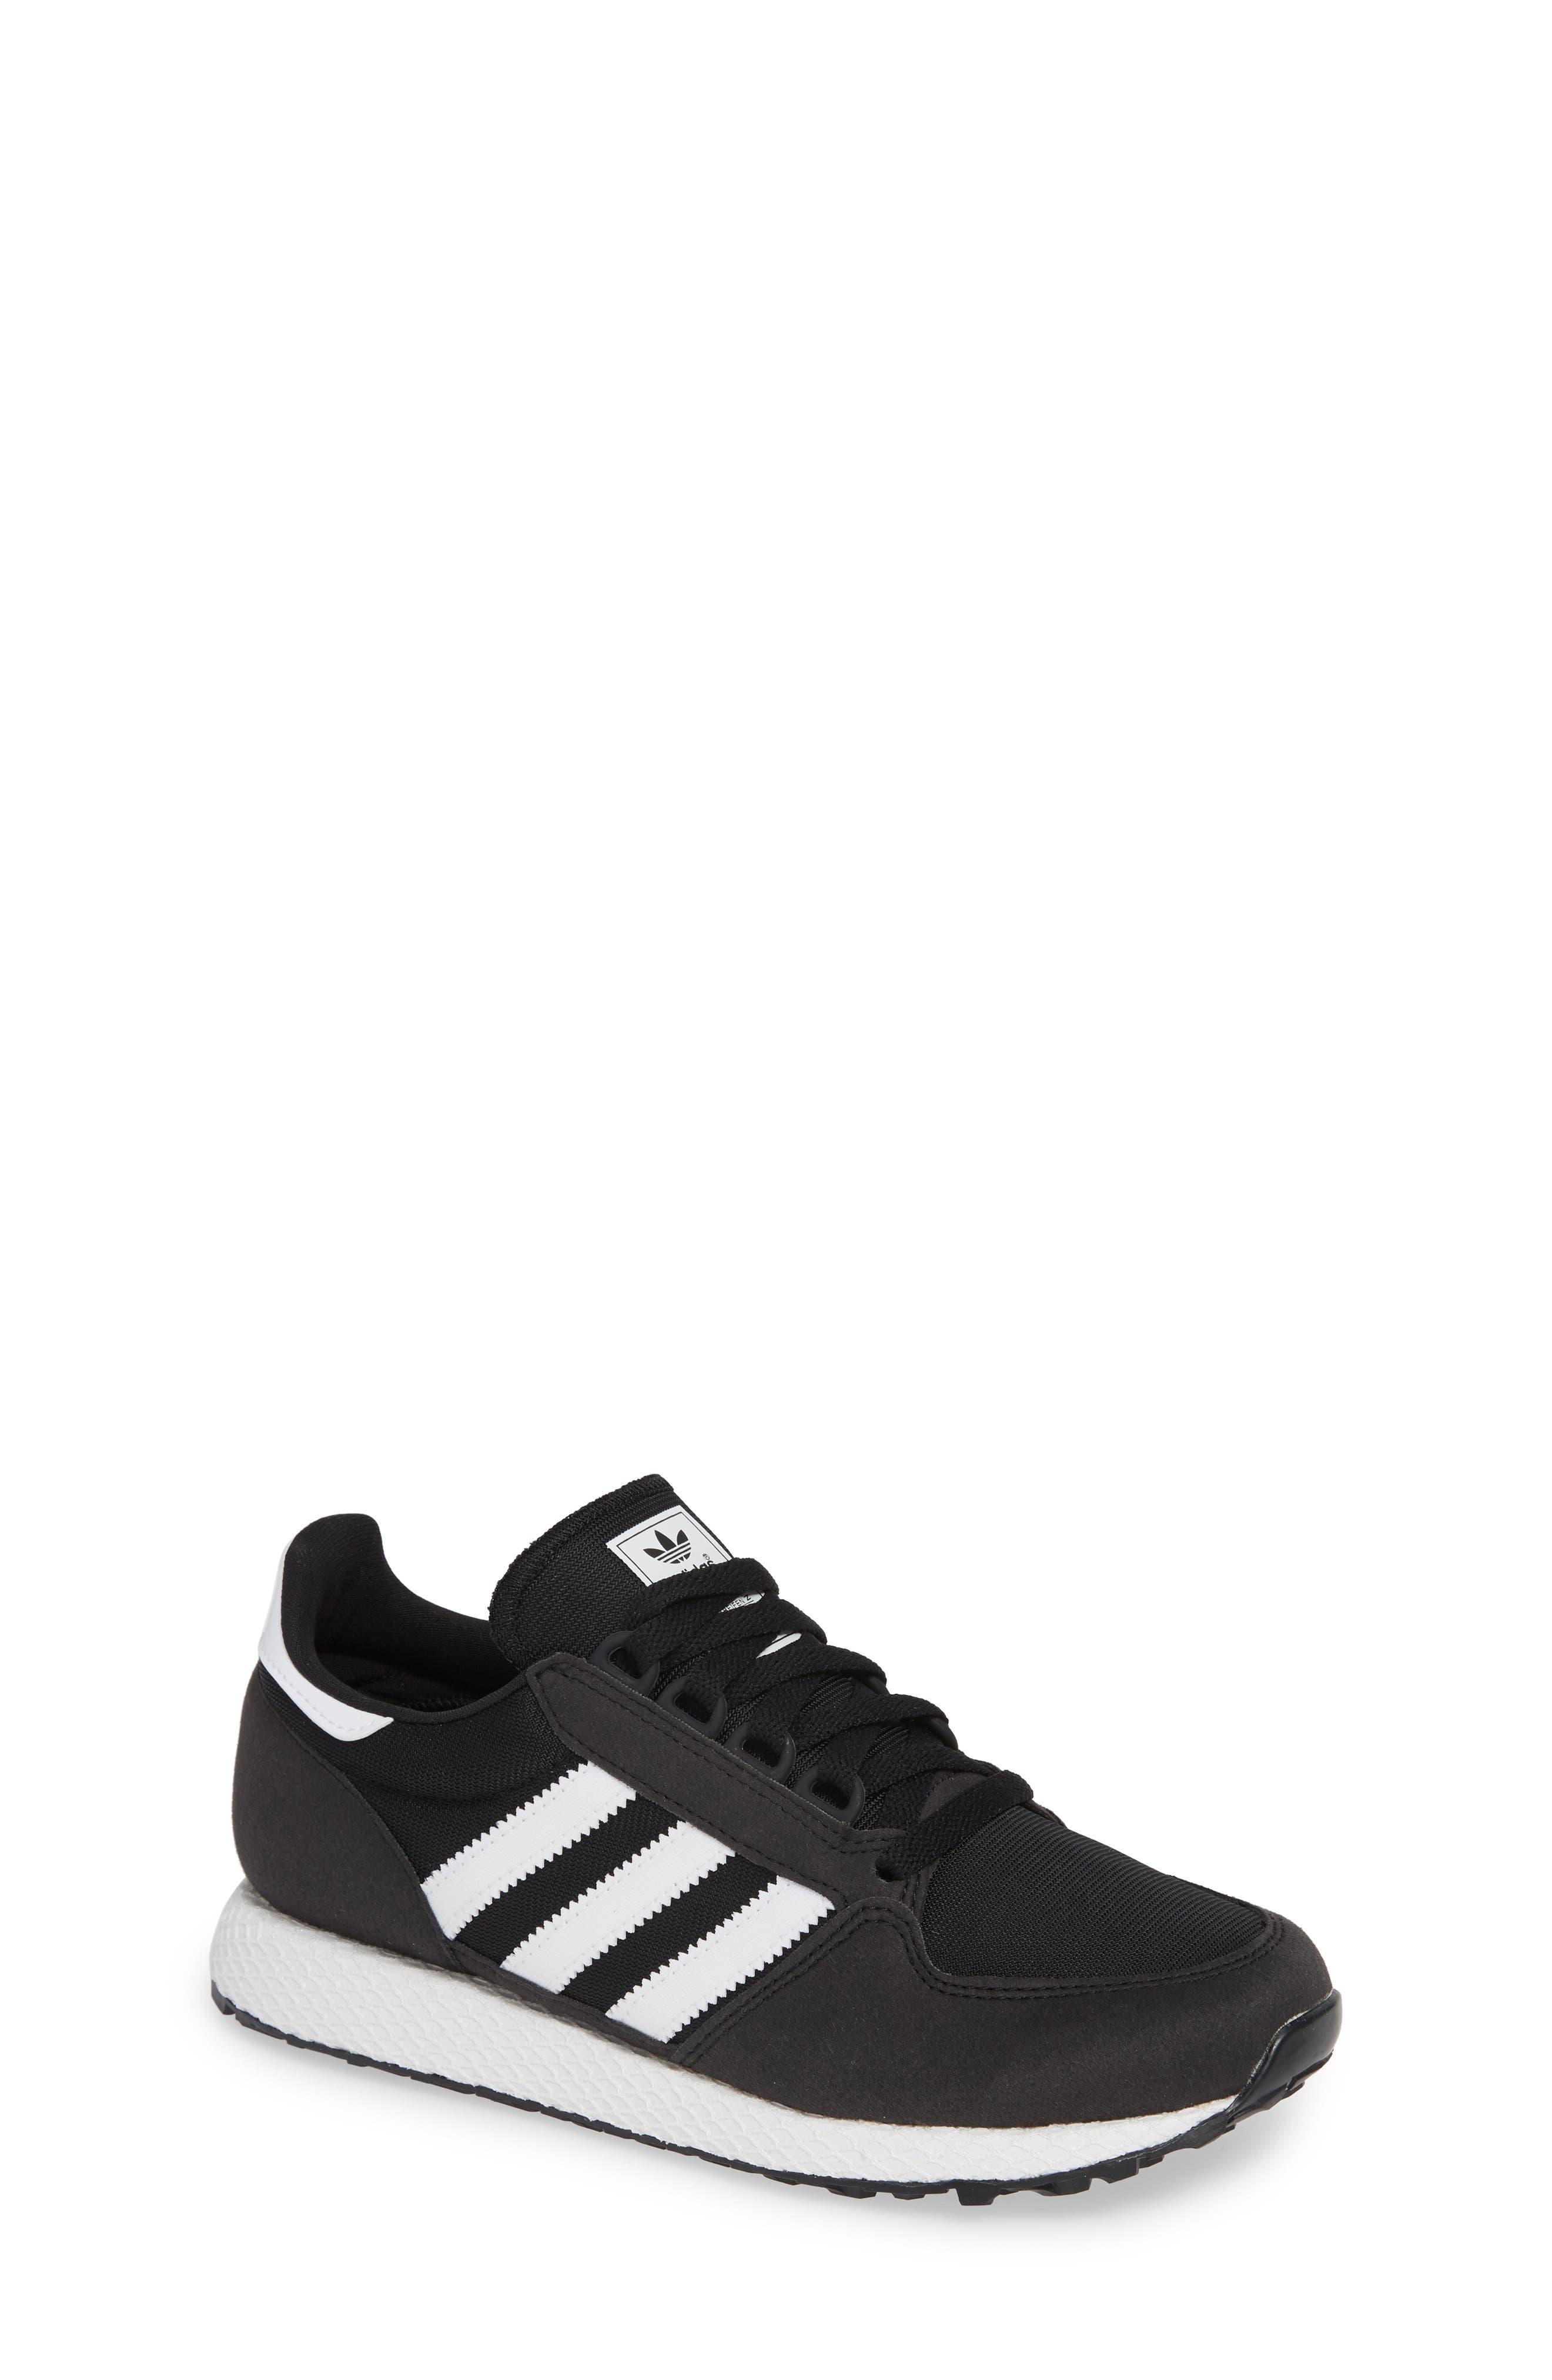 Forest Grove Sneaker,                             Main thumbnail 1, color,                             BLACK/ WHITE/ BLACK